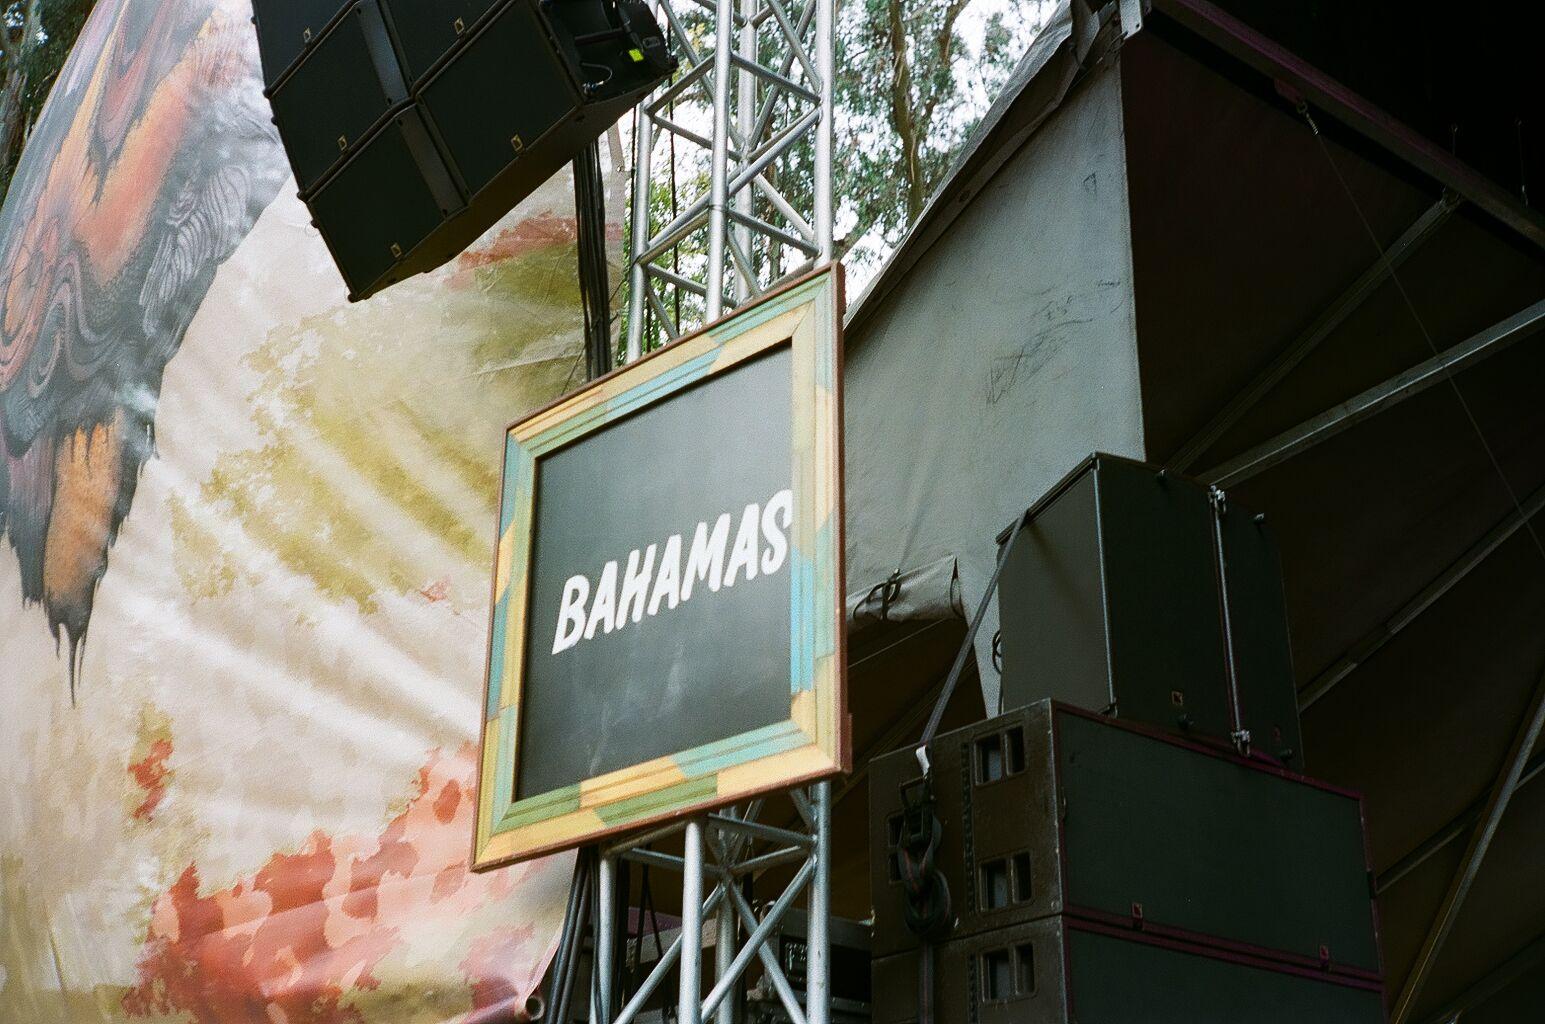 Bahamas at Outside Lands Festival in San Francisco, CA Kodak Portra 400 35mm Film Photography | SarahMichiko.com